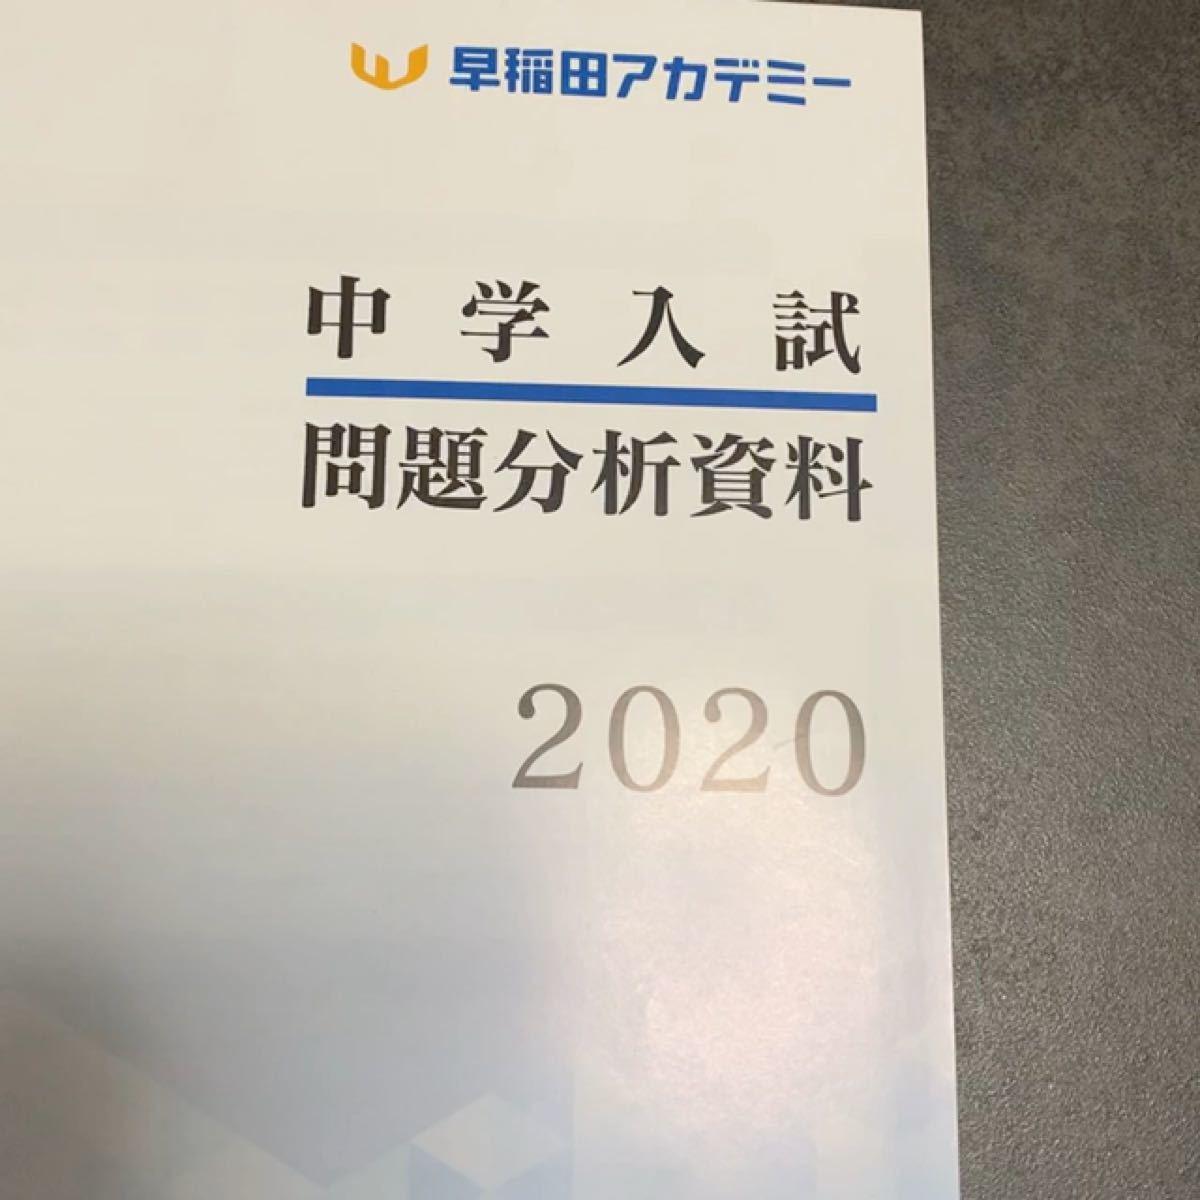 中学入試 問題分析資料 2020年 合格パスポート 中学受験用 中学入試データ